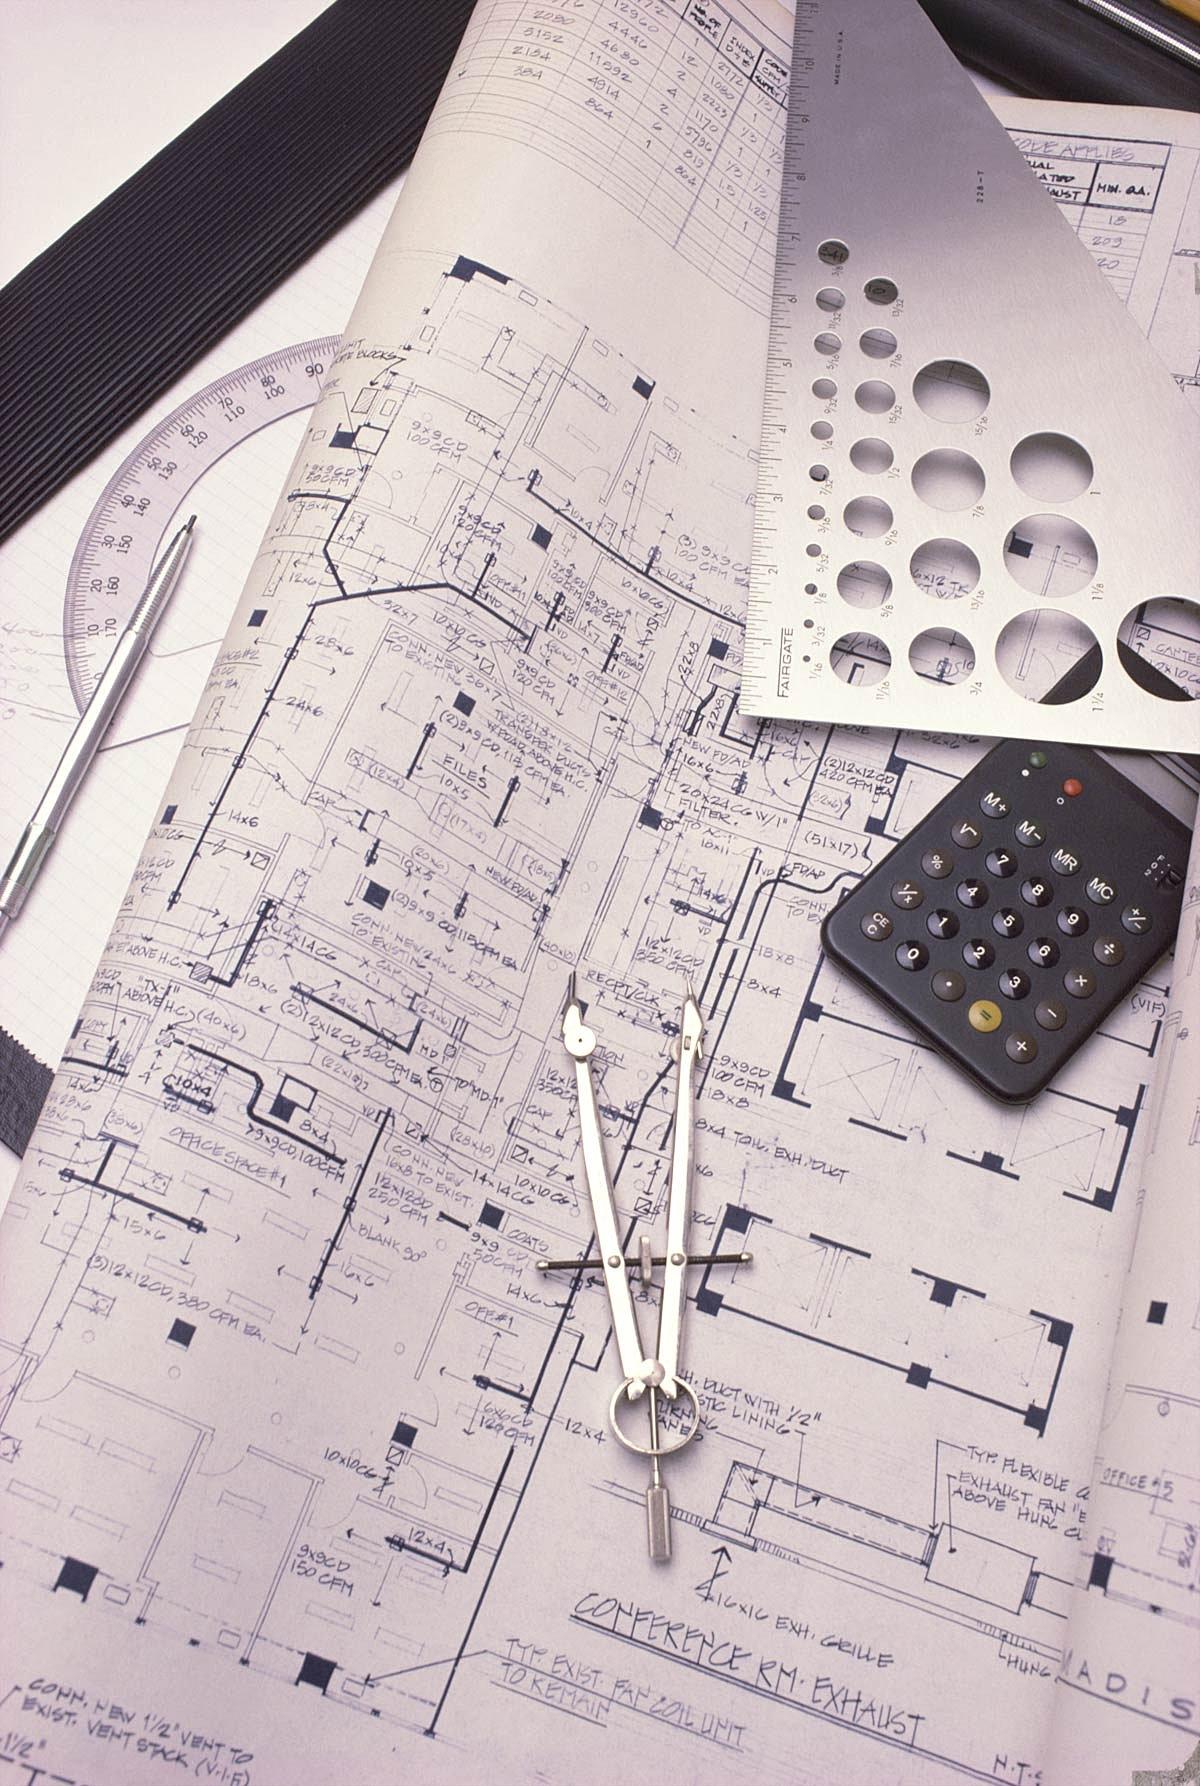 Structural engineers los angeles greystone engineering group inc structural engineers los angeles greystone engineering group inc blueprint design malvernweather Gallery